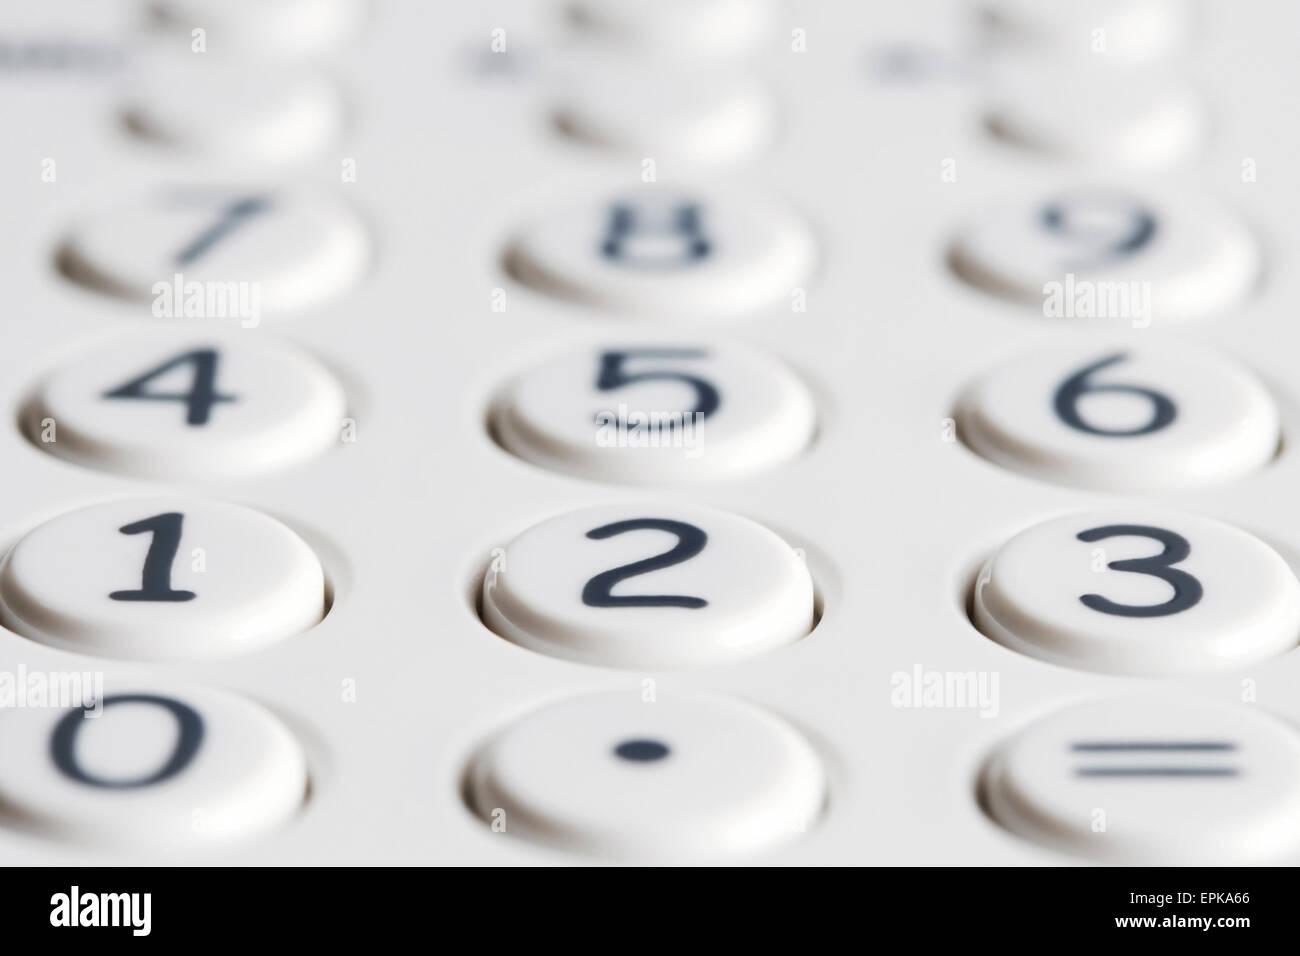 Closeup of calculator keypad - Stock Image